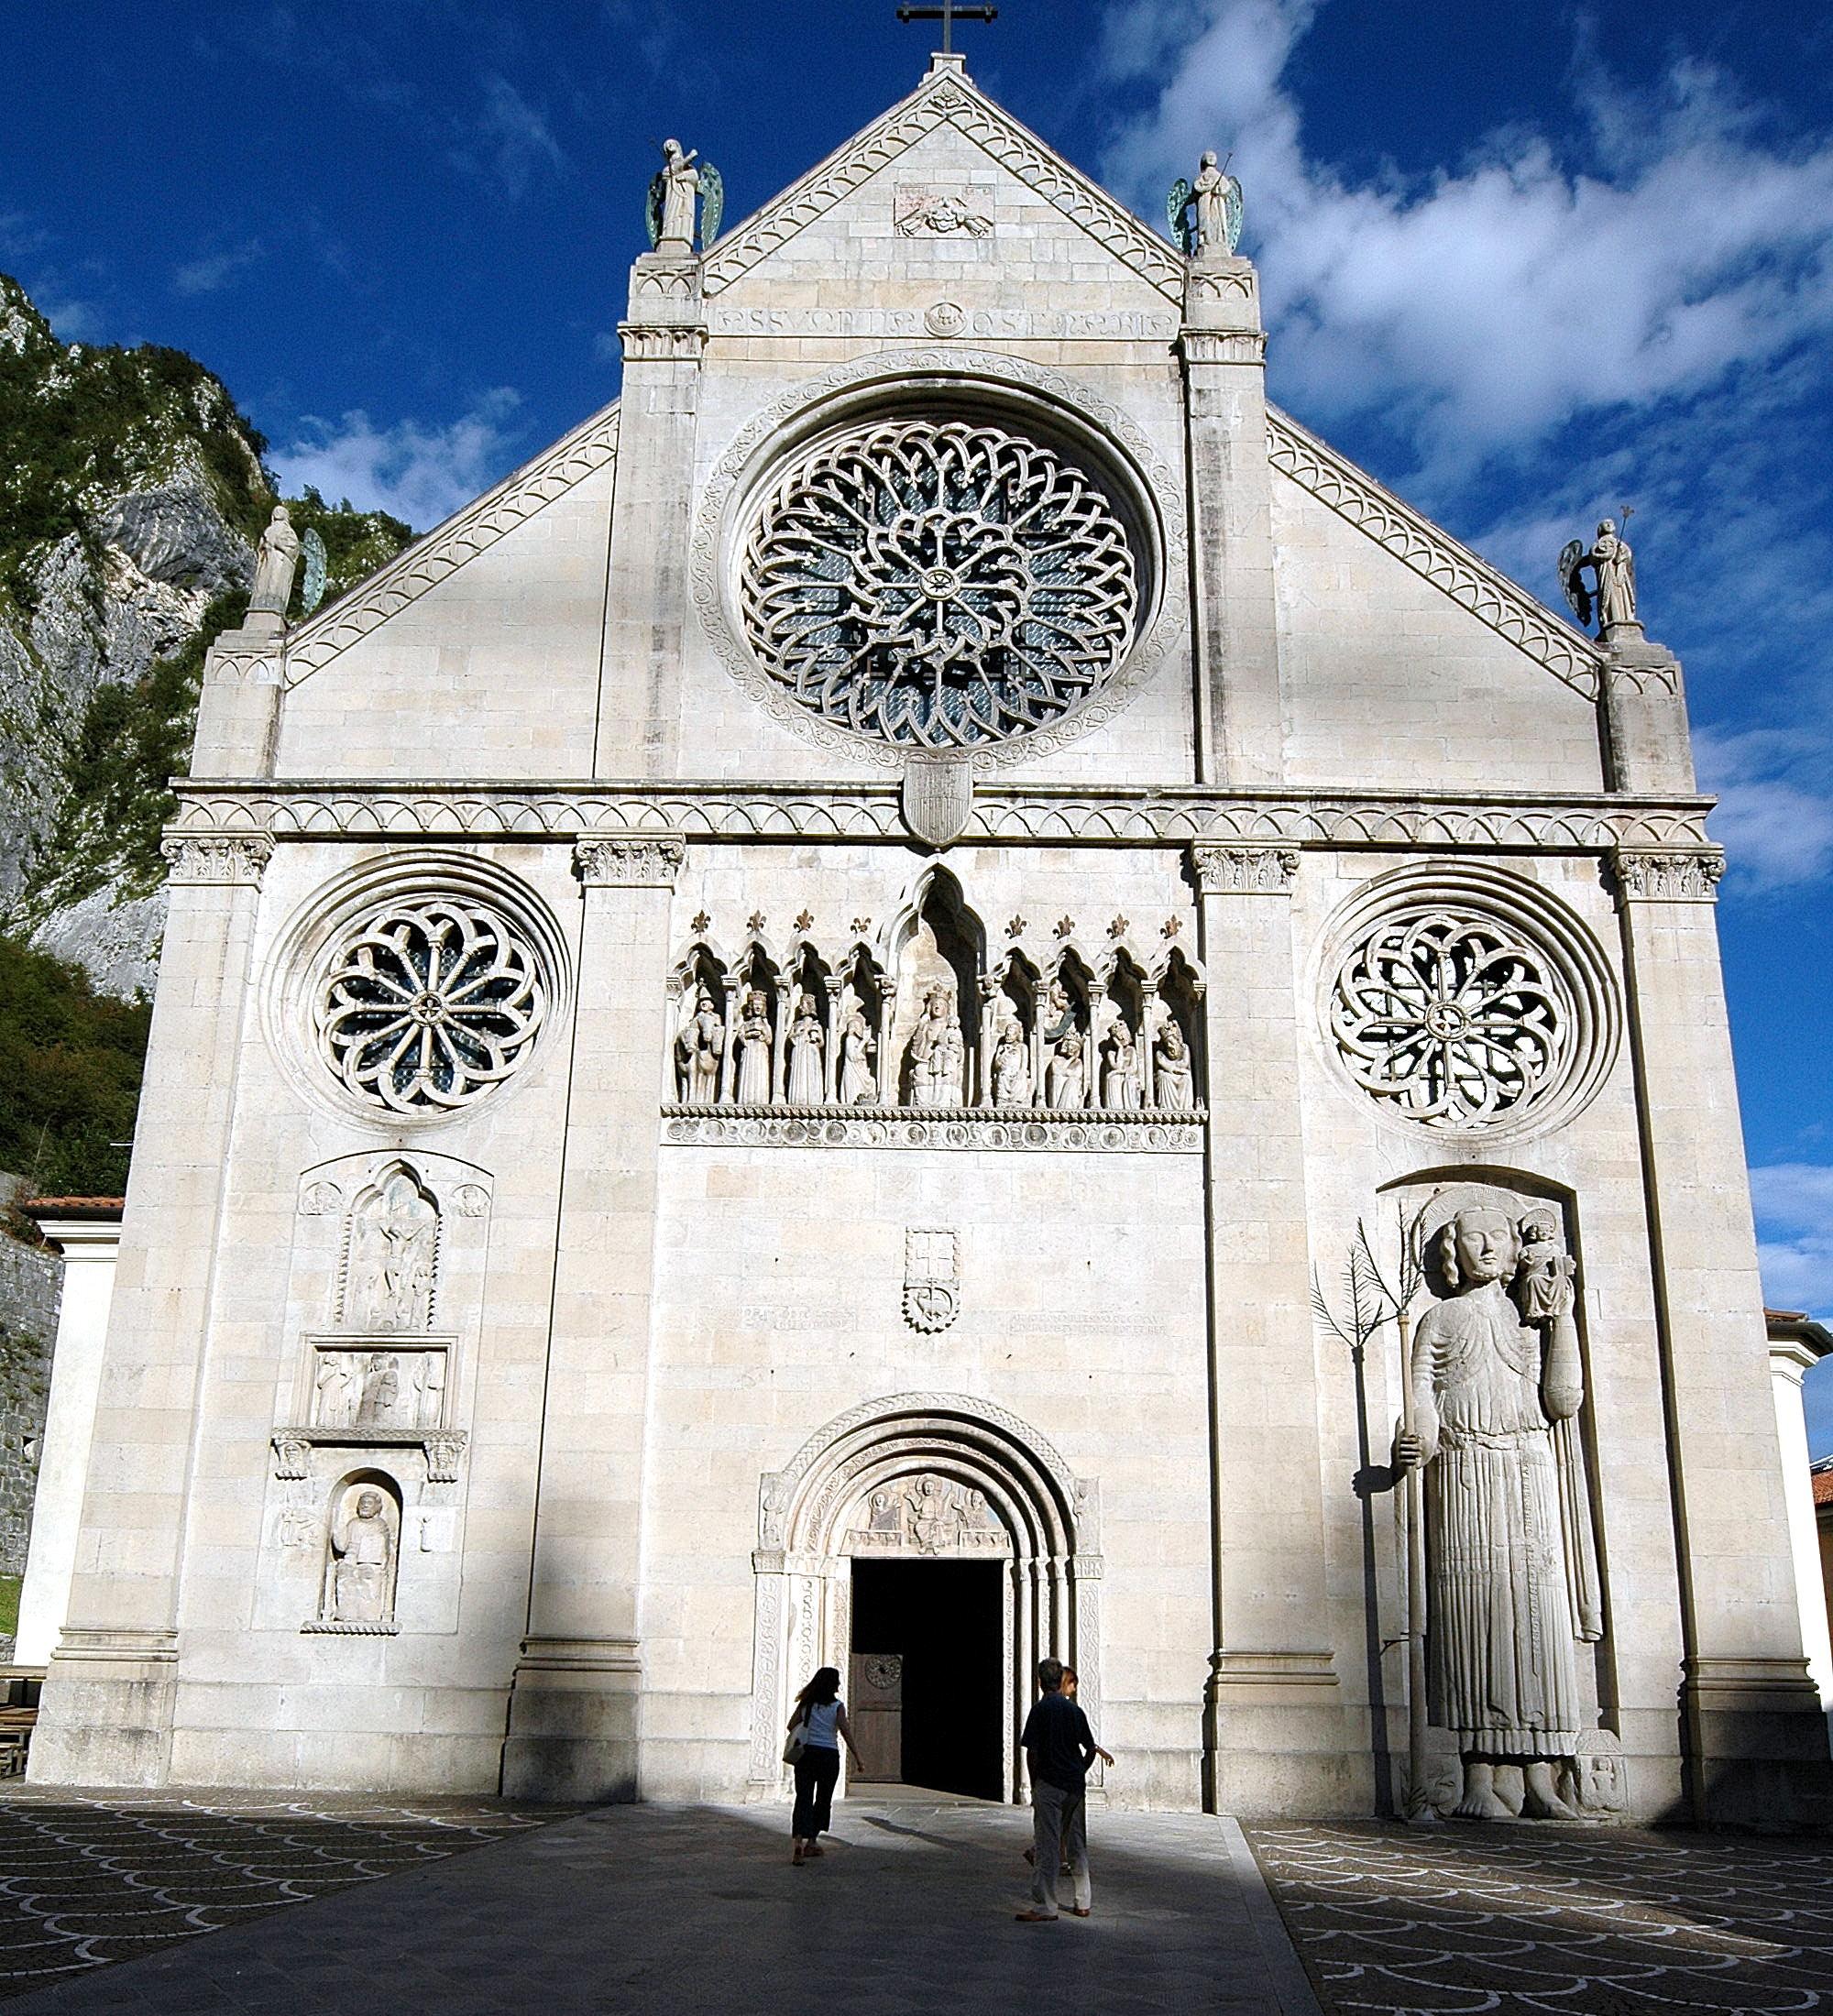 Gemona_Duomo_di_Santa_Maria_Assunta_14082004_01 wikipedia